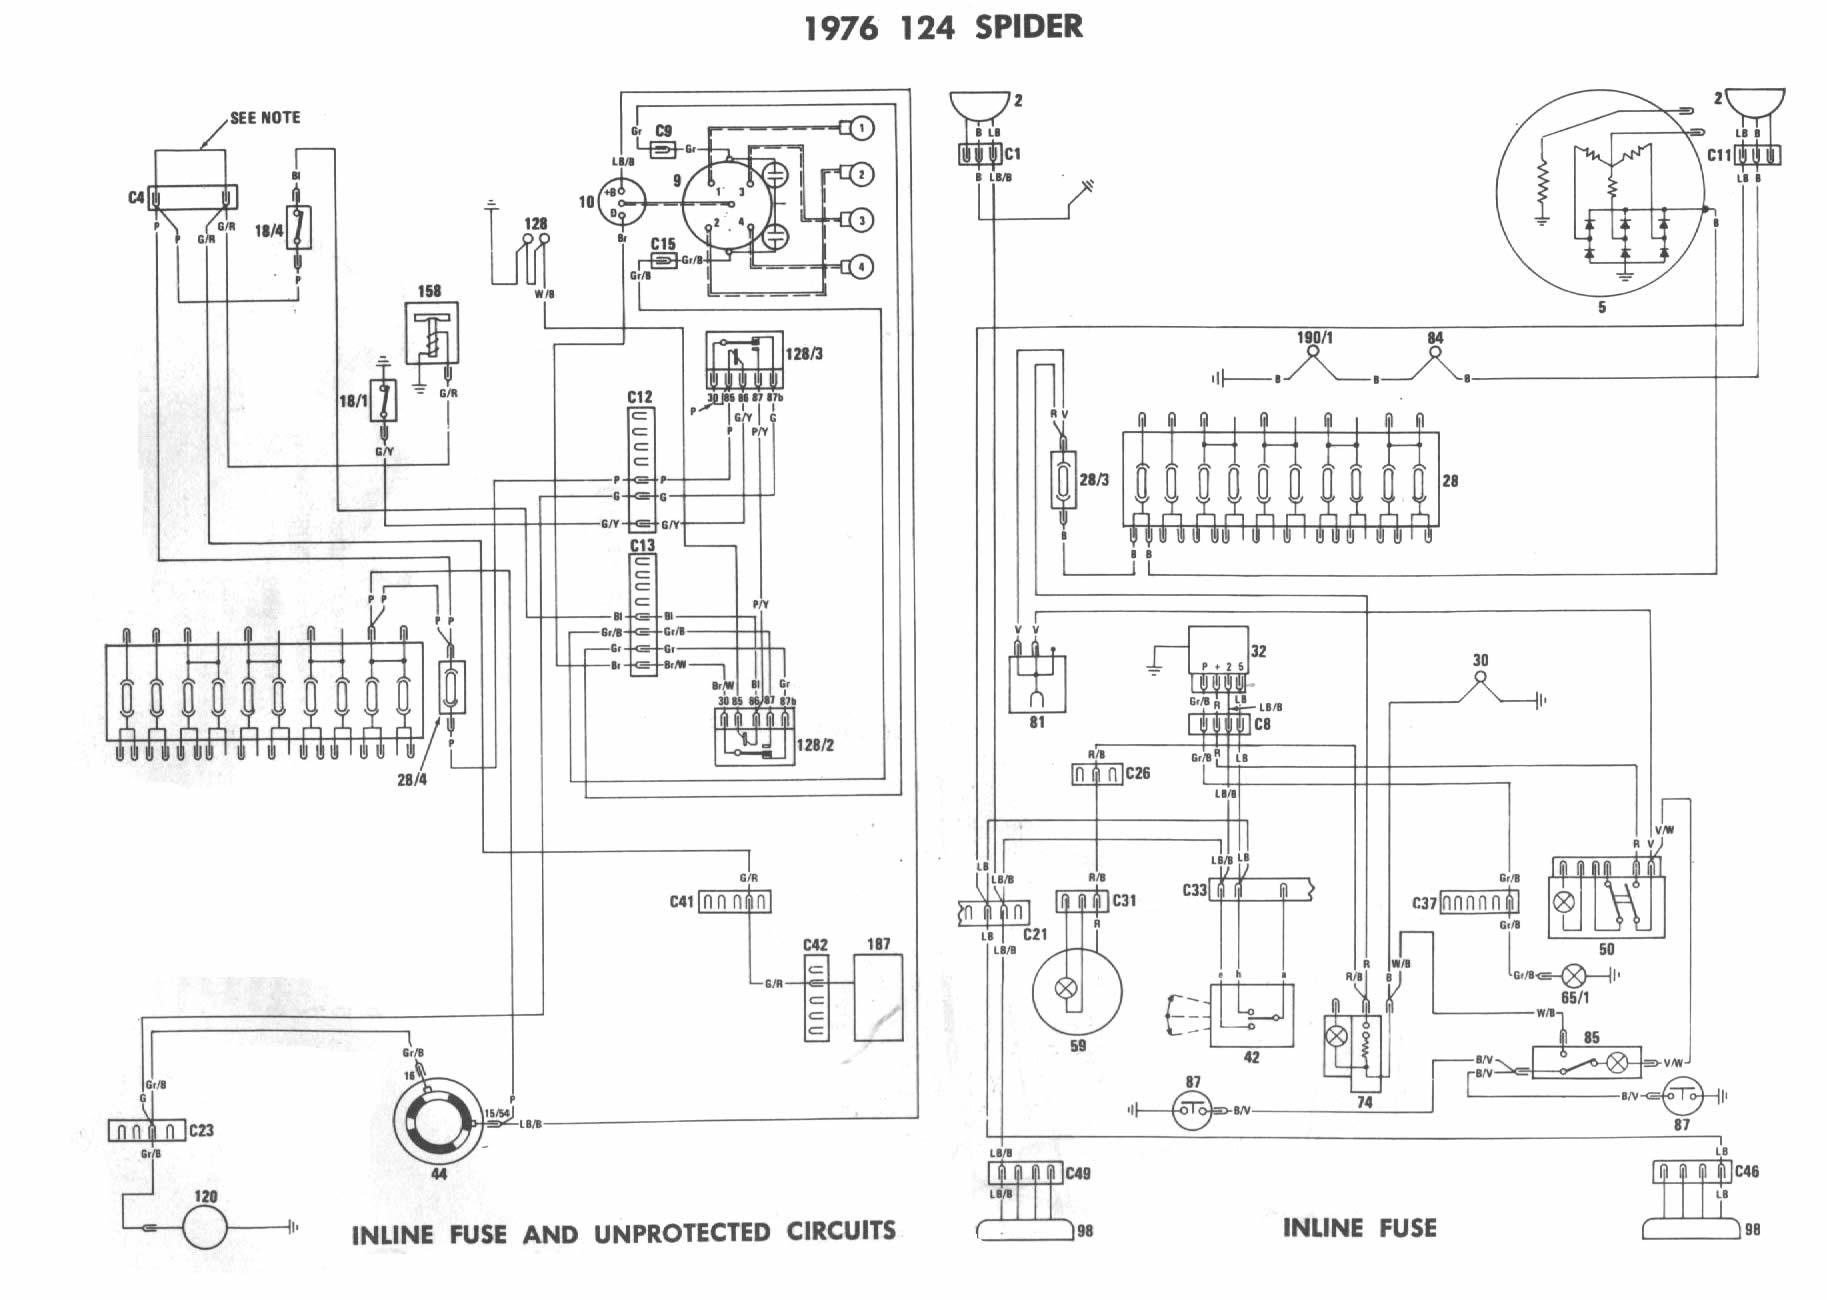 1981 fiat spider wiring diagrams